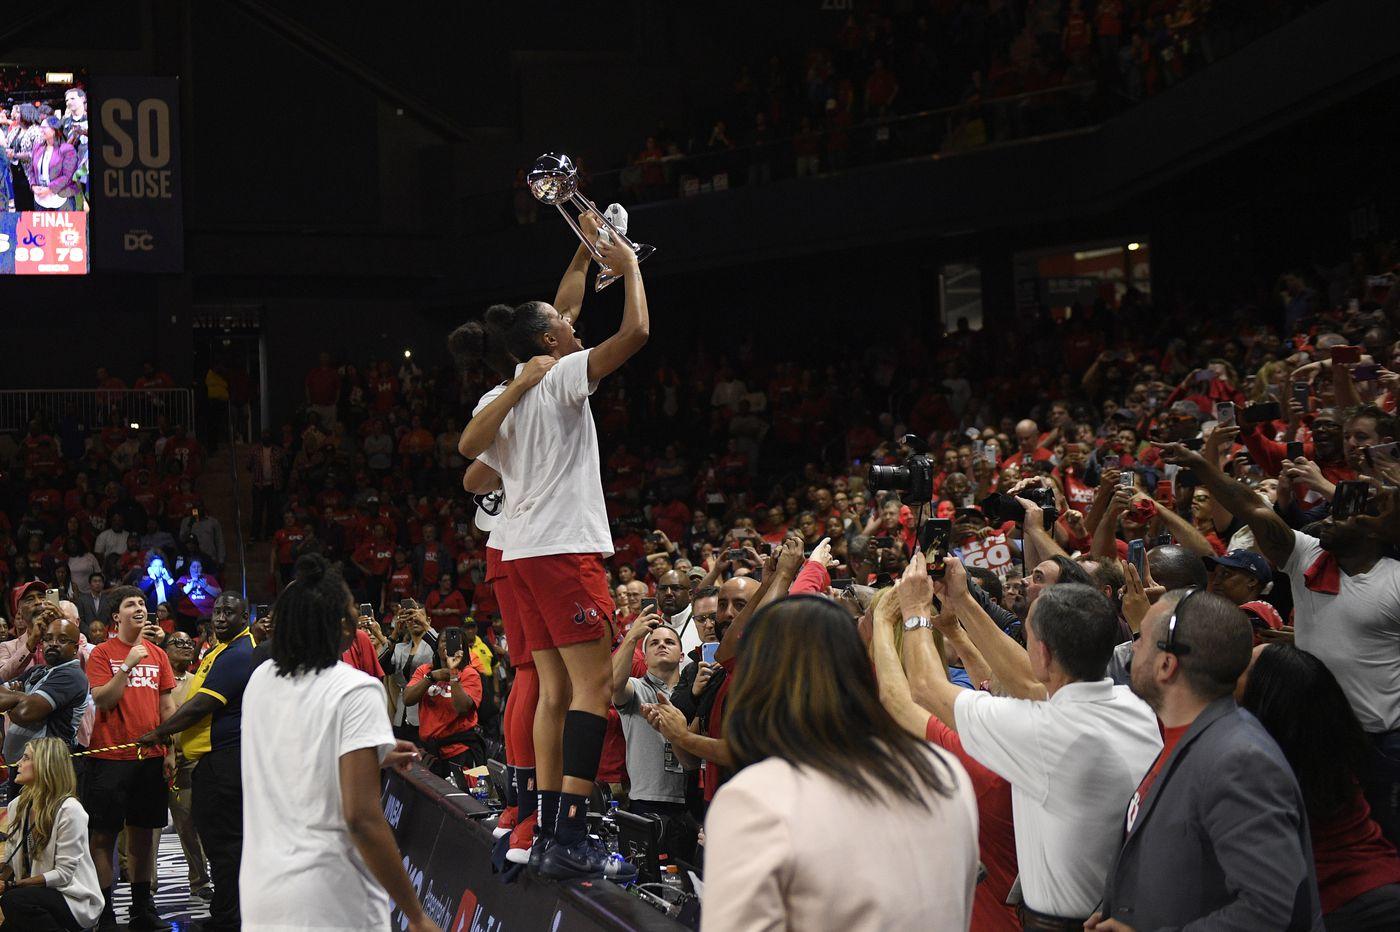 Elena Delle Donne, Washington Mystics win first WNBA title, beating Connecticut Sun 89-78 in Game 5